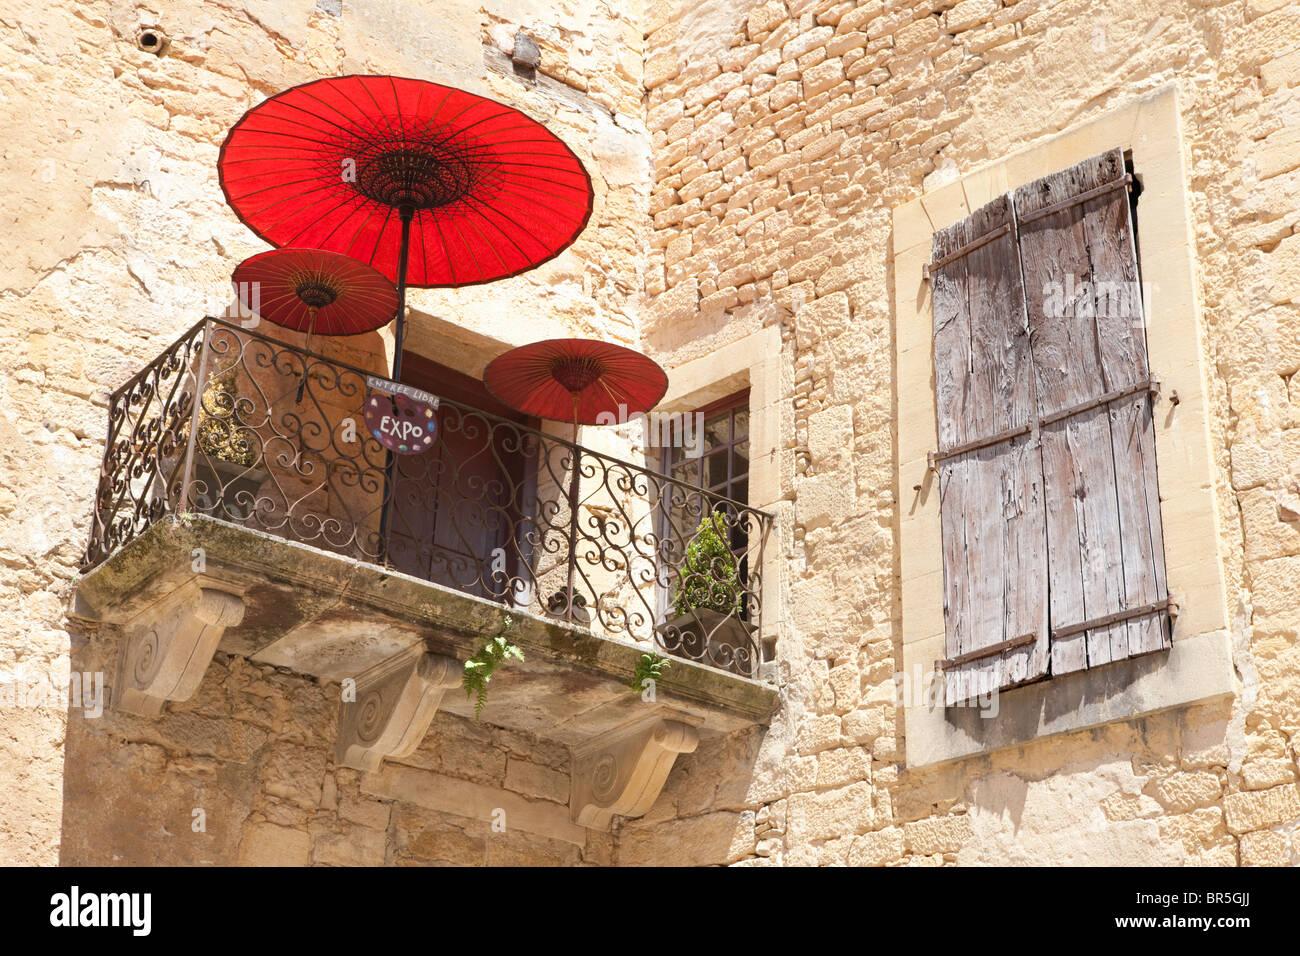 Red parasol on balcony, Sarlat-la-Caneda; Dordogne; France - Stock Image